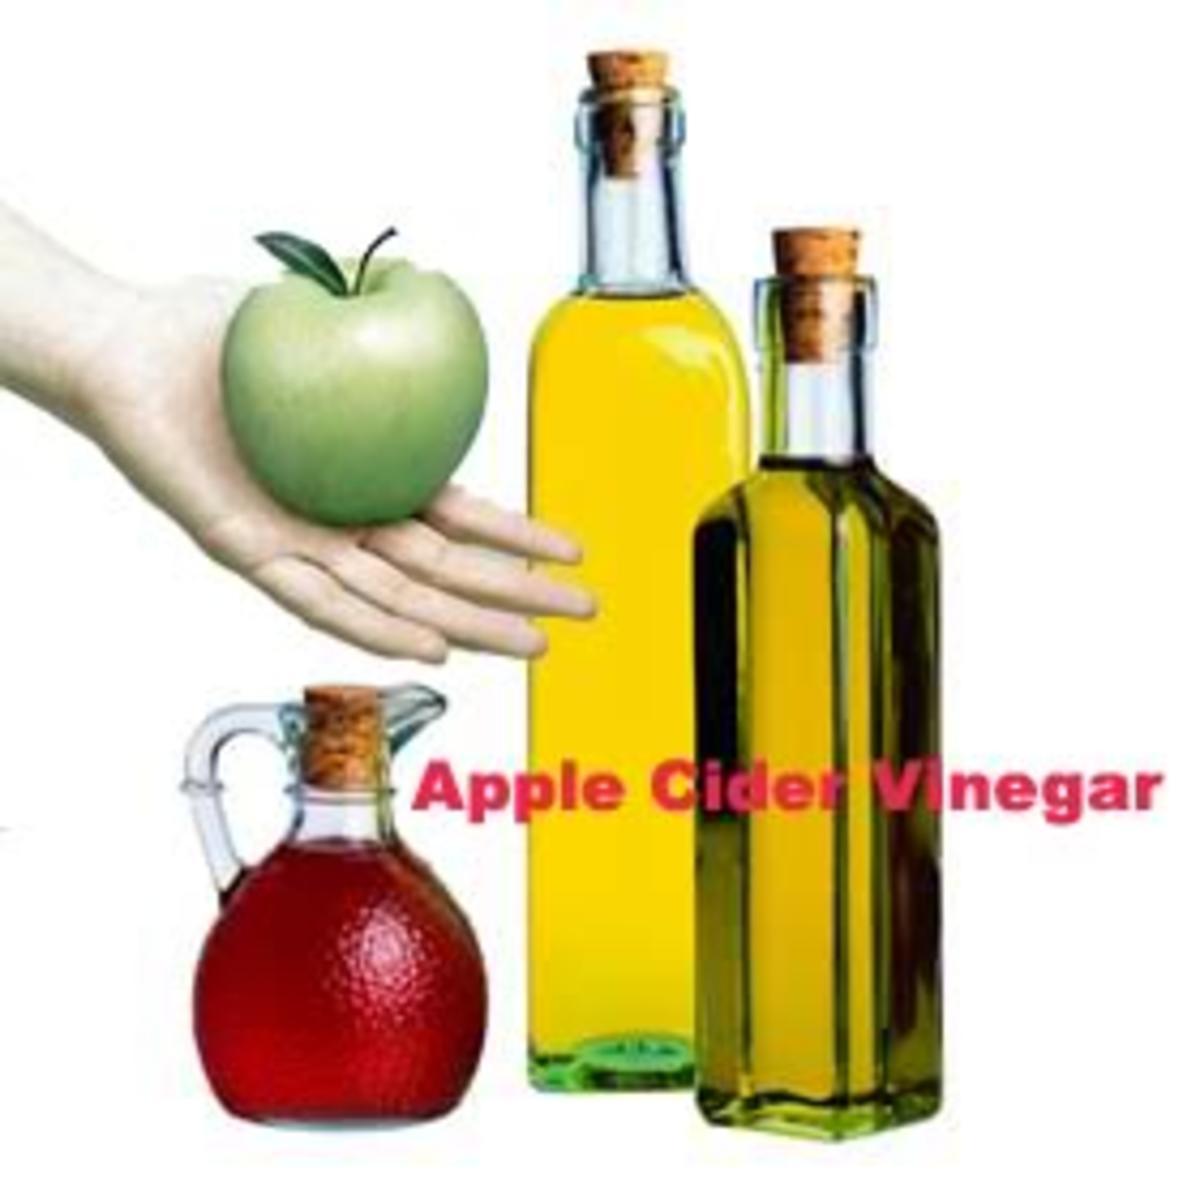 Apple Cider Vinegar (Photo Credit: kim53matthews photobucket)